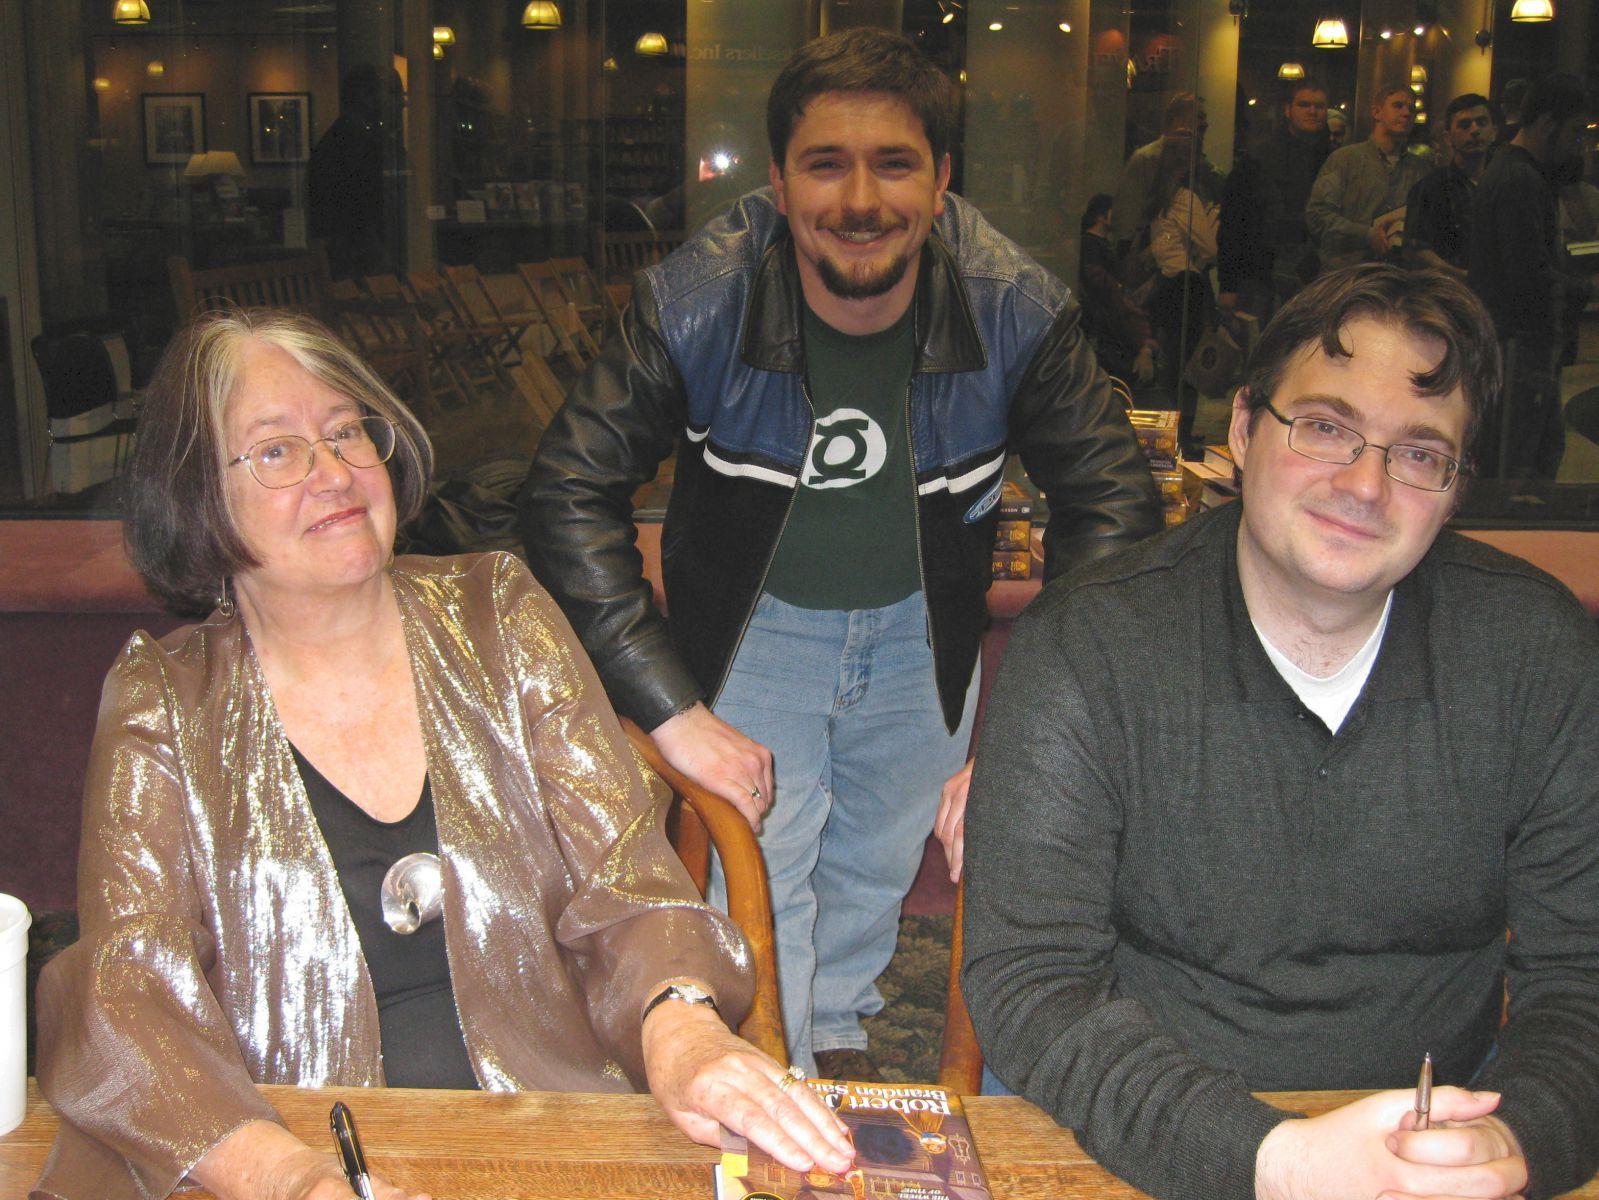 Meeting Brandon and Harriet